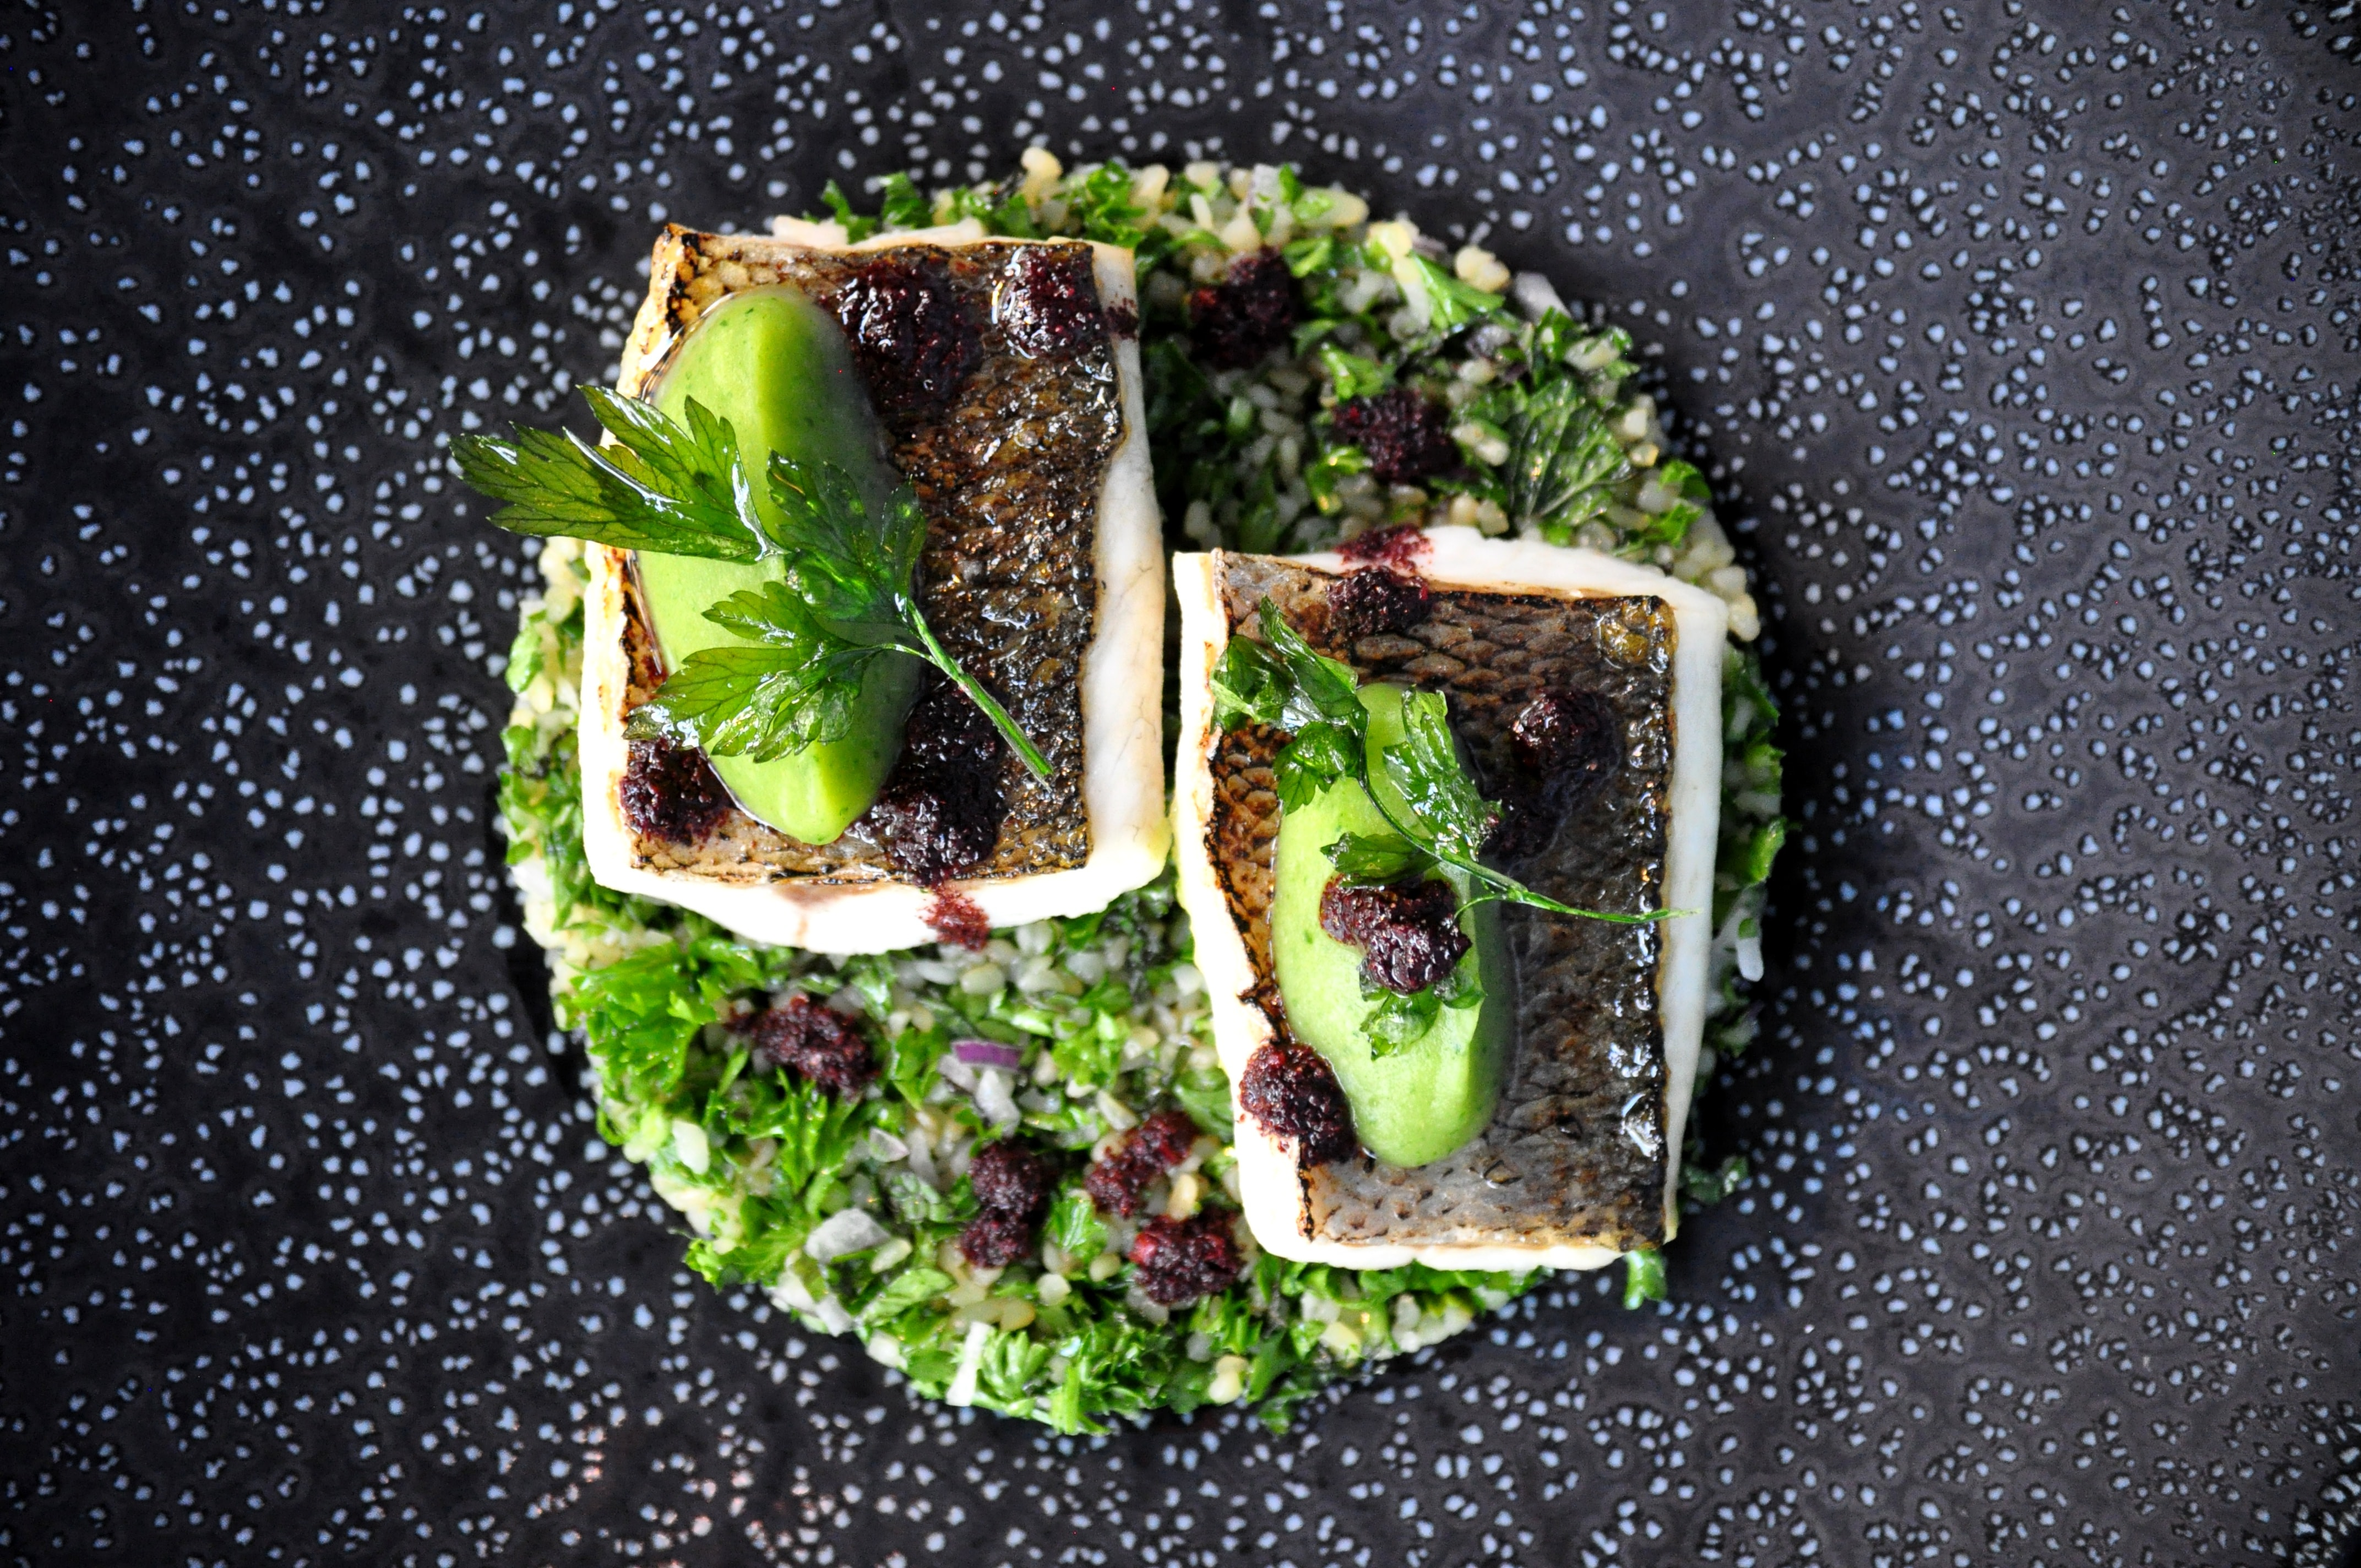 Sea Bass, Senses Restaurant, 10 Best Restaurants In Amsterdam To Visit For Great Food